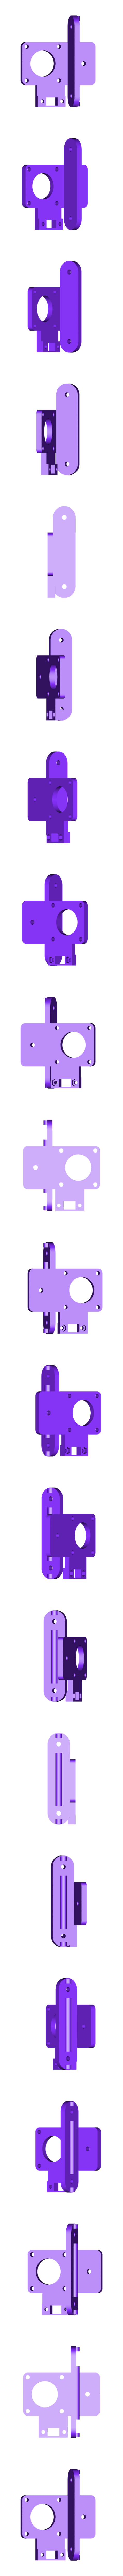 MotorMountOpticalFilamentSensorV2.stl Download free STL file Optical Filament Sensor and Motor Mount and Install Tutorial • 3D print object, EdBraiman